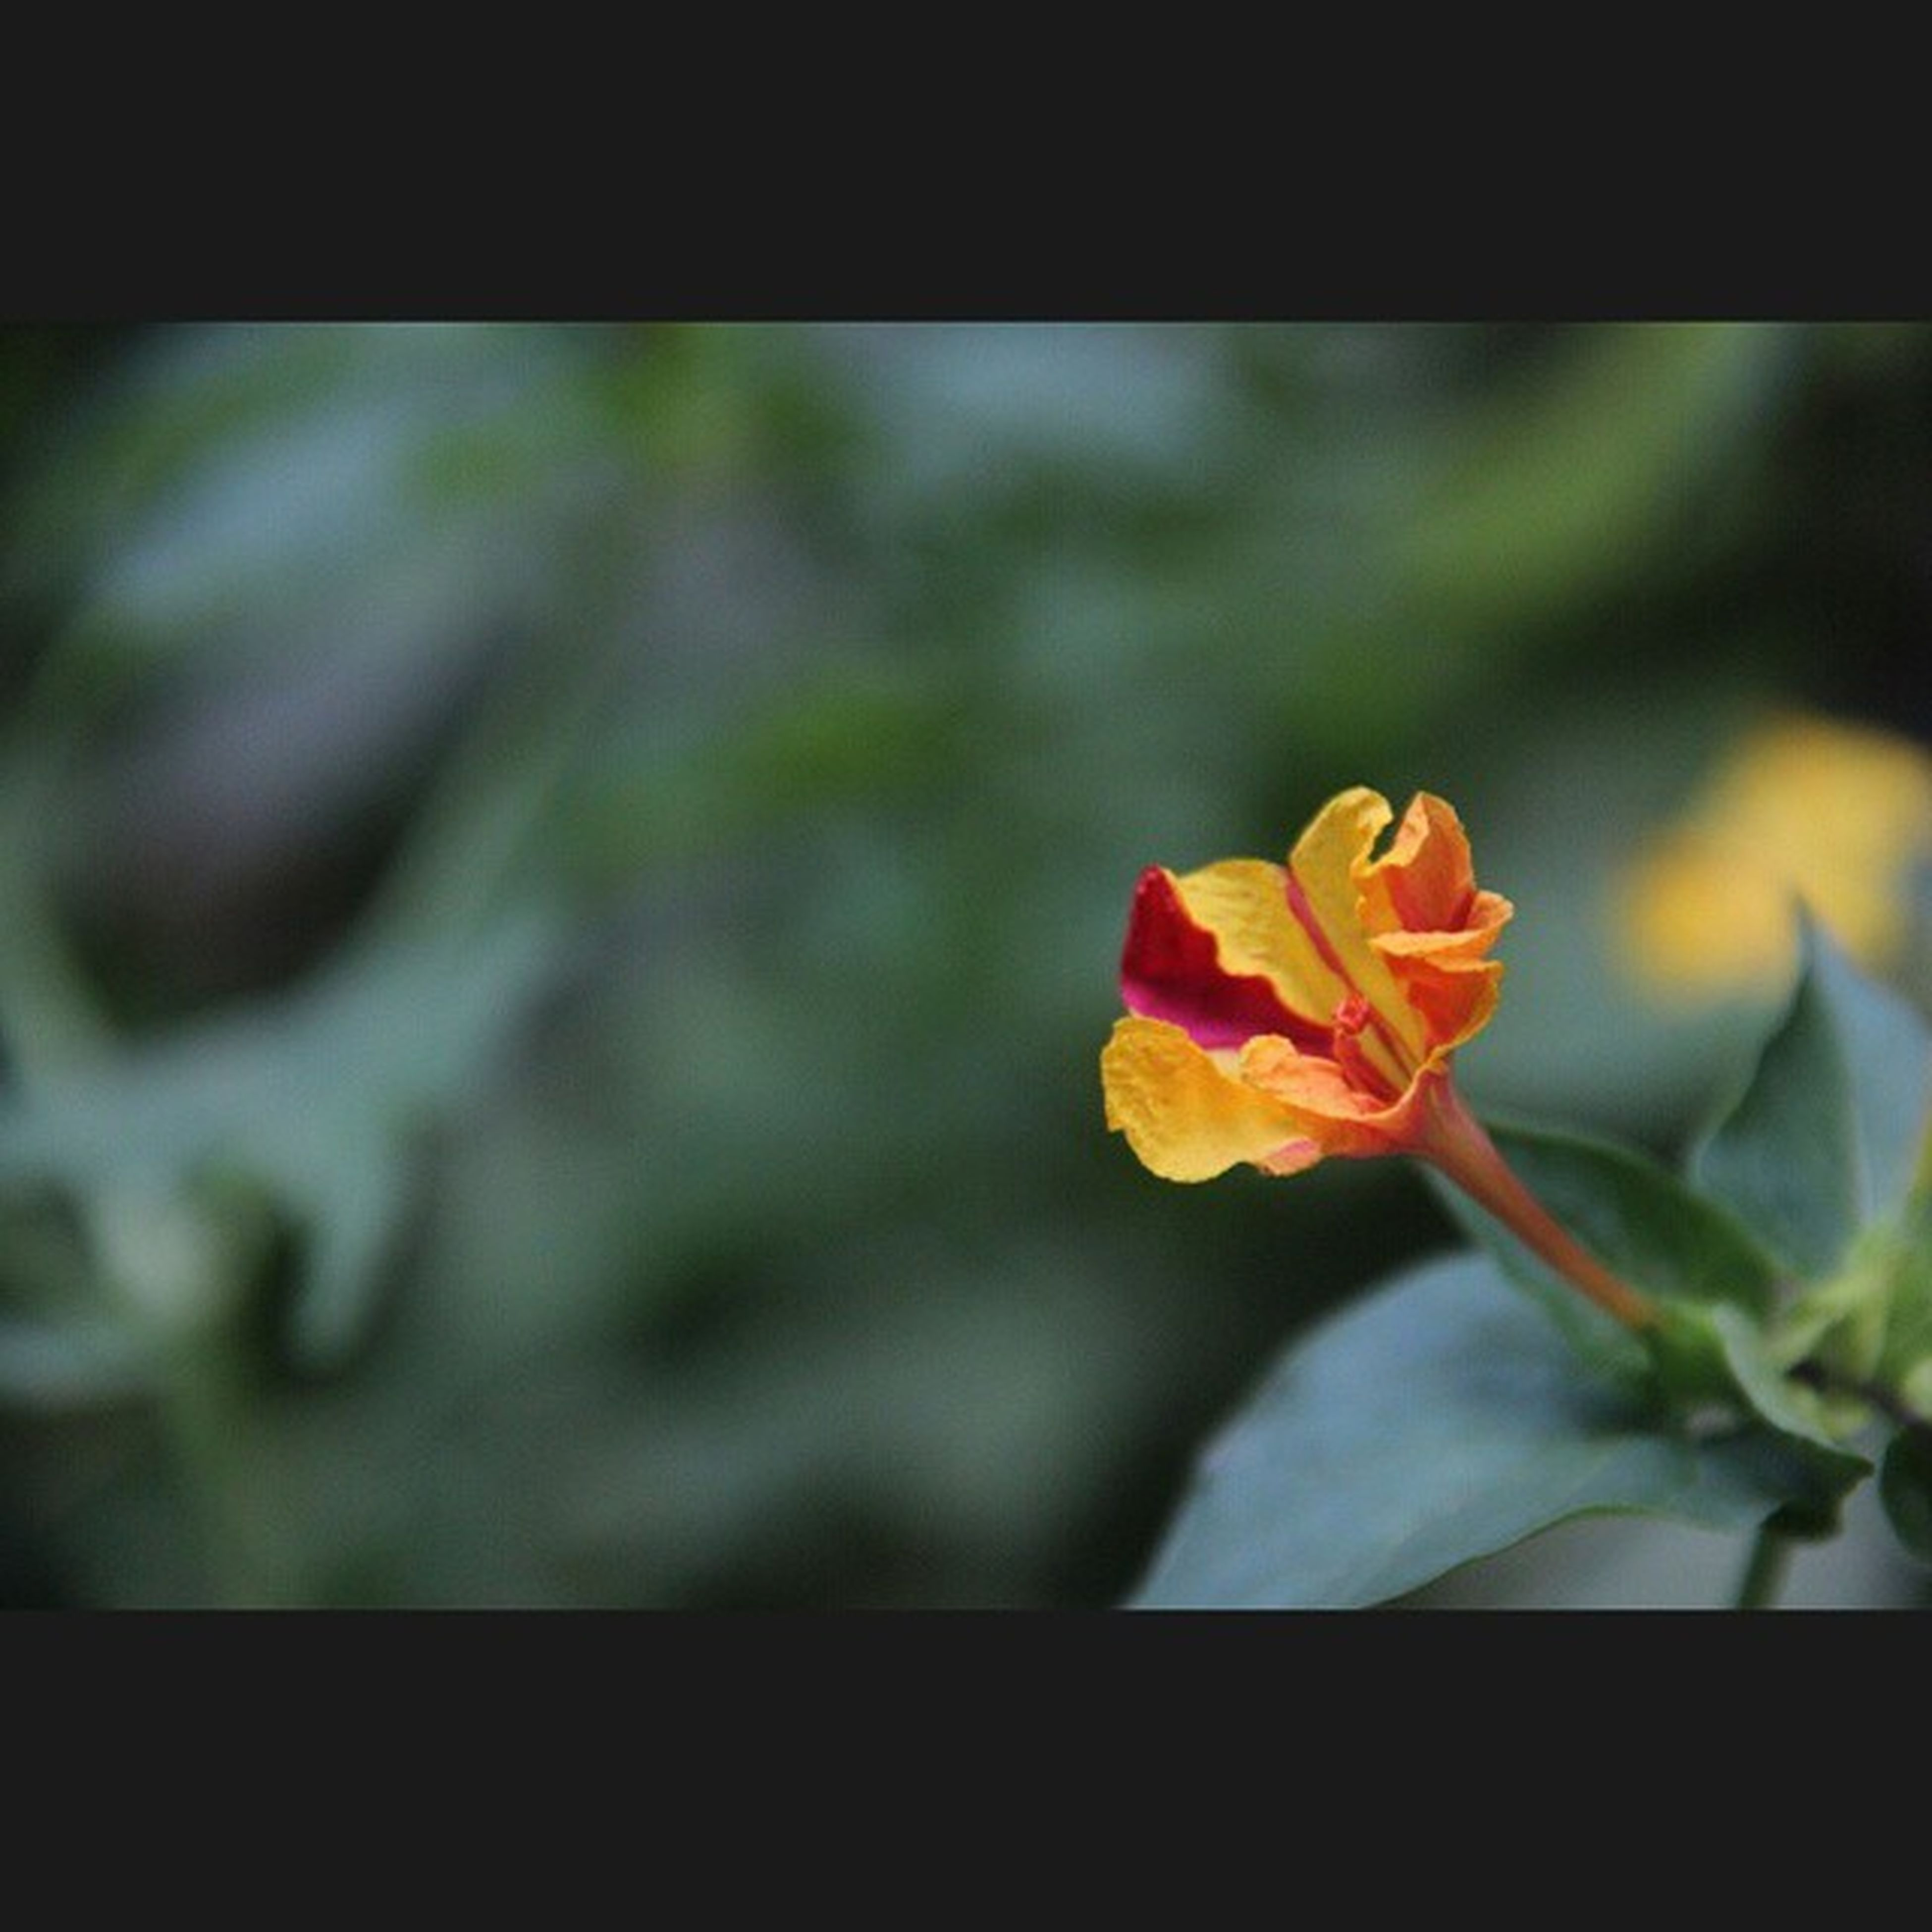 Simplicity. Flower Flowerssofinstagram Colorful Green Gogreen Flowerstagram Floweroftheday Buffering Nofilter Mustaffa HASHTAG Tagsforlikes Follow